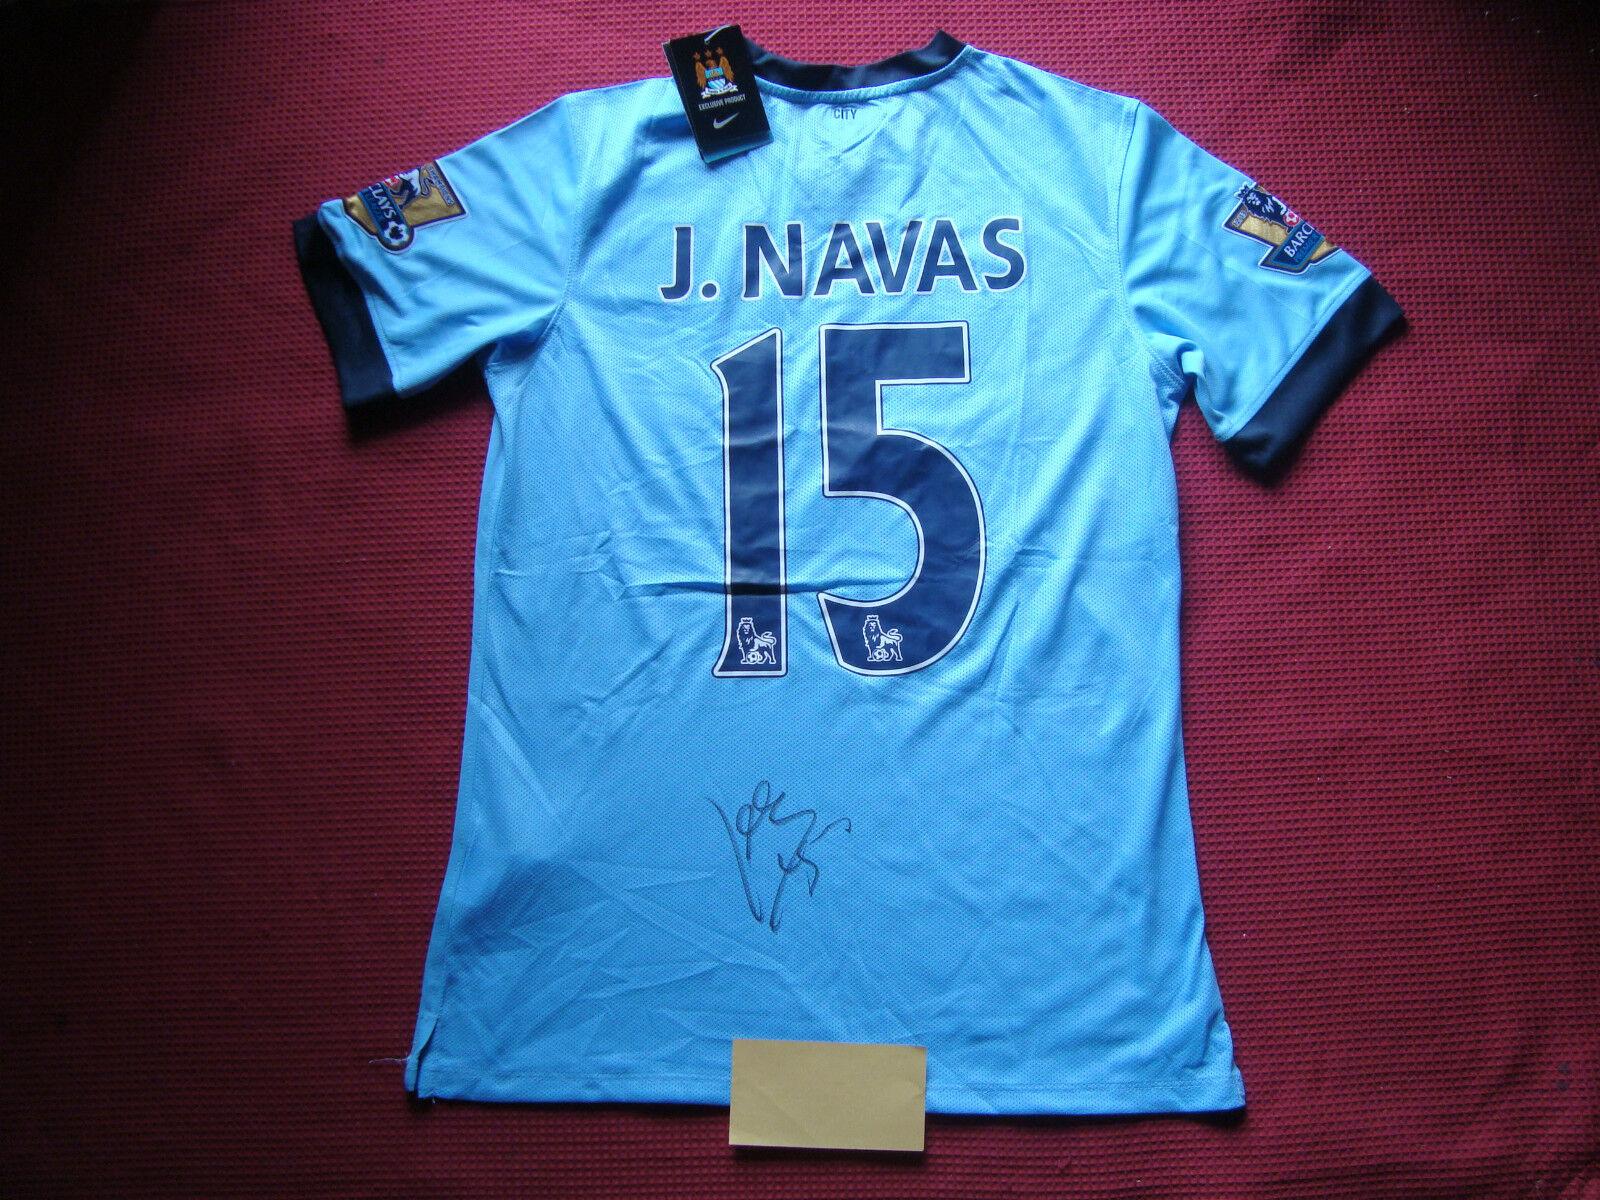 Manchester City Jesús Navas mano firmado 2014-15 Camiseta Jersey-BNWT-foto prueba